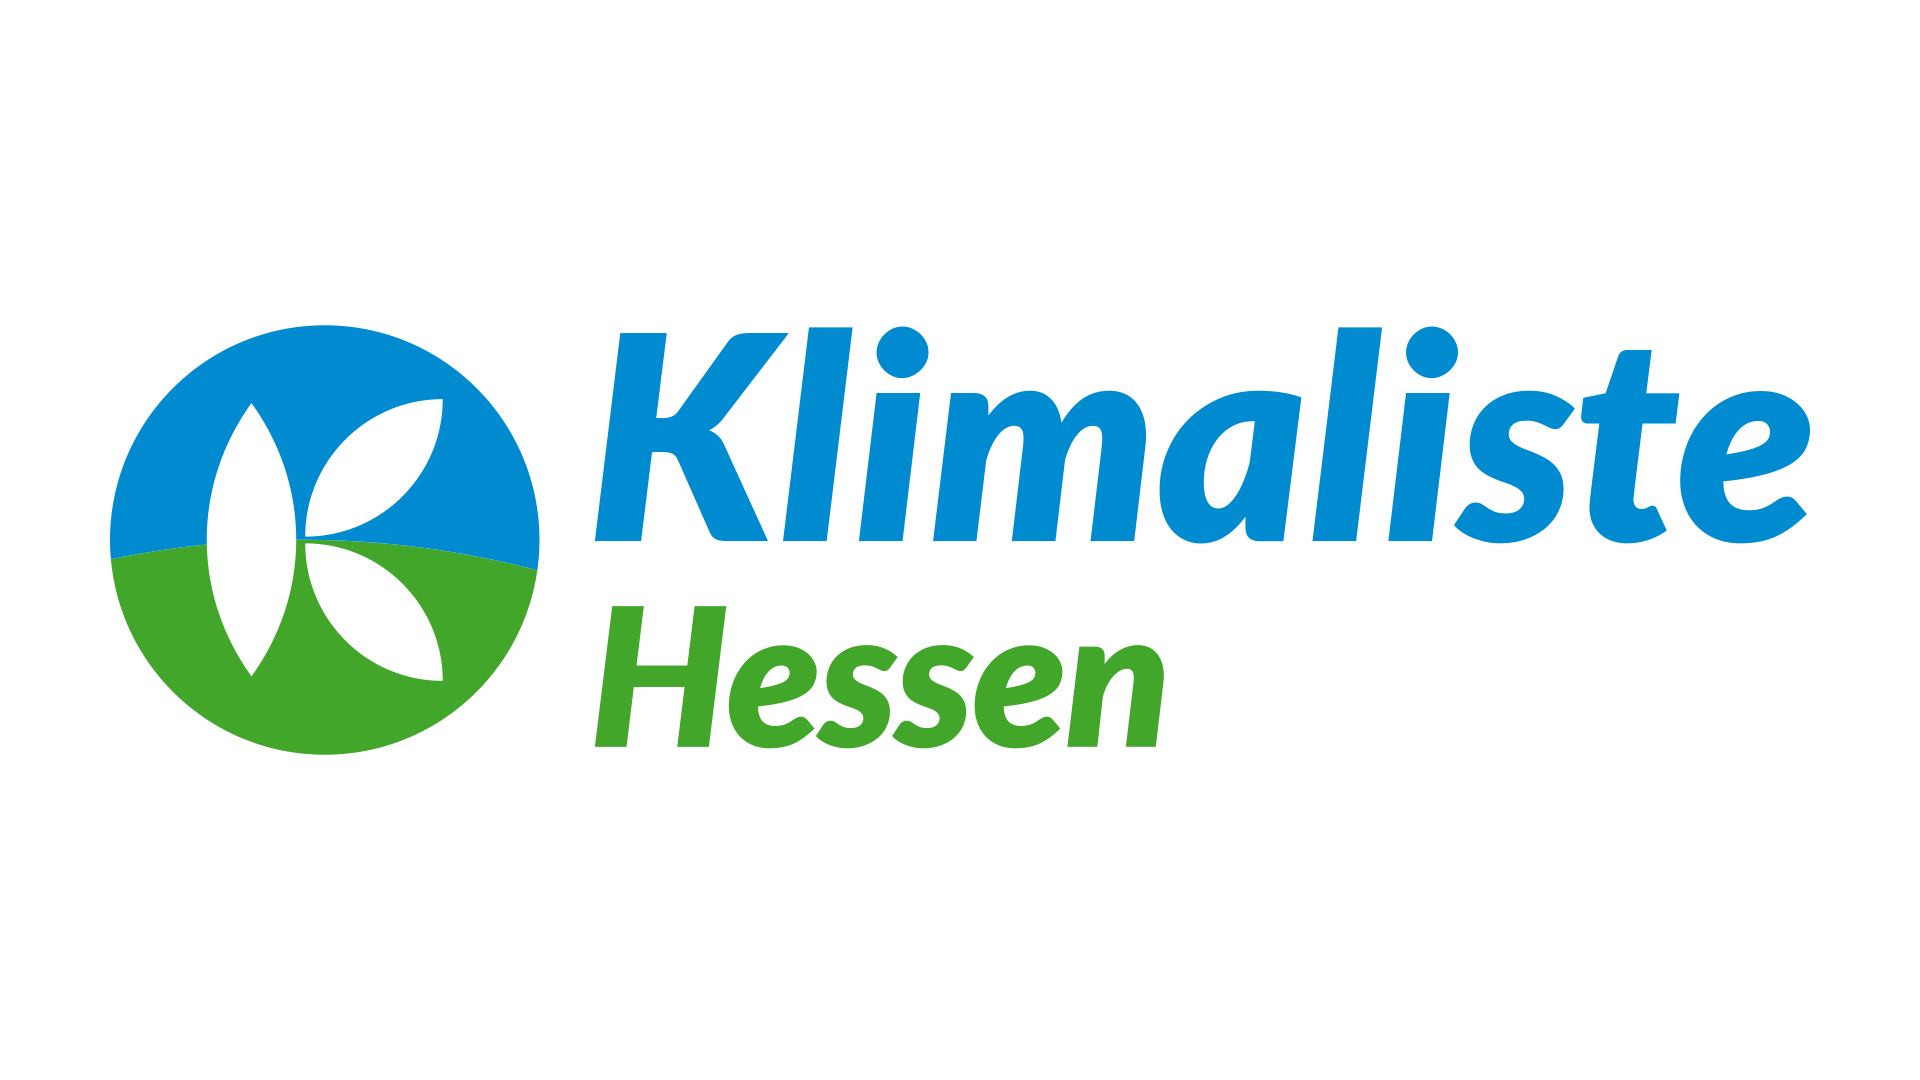 Klimaliste Hessen